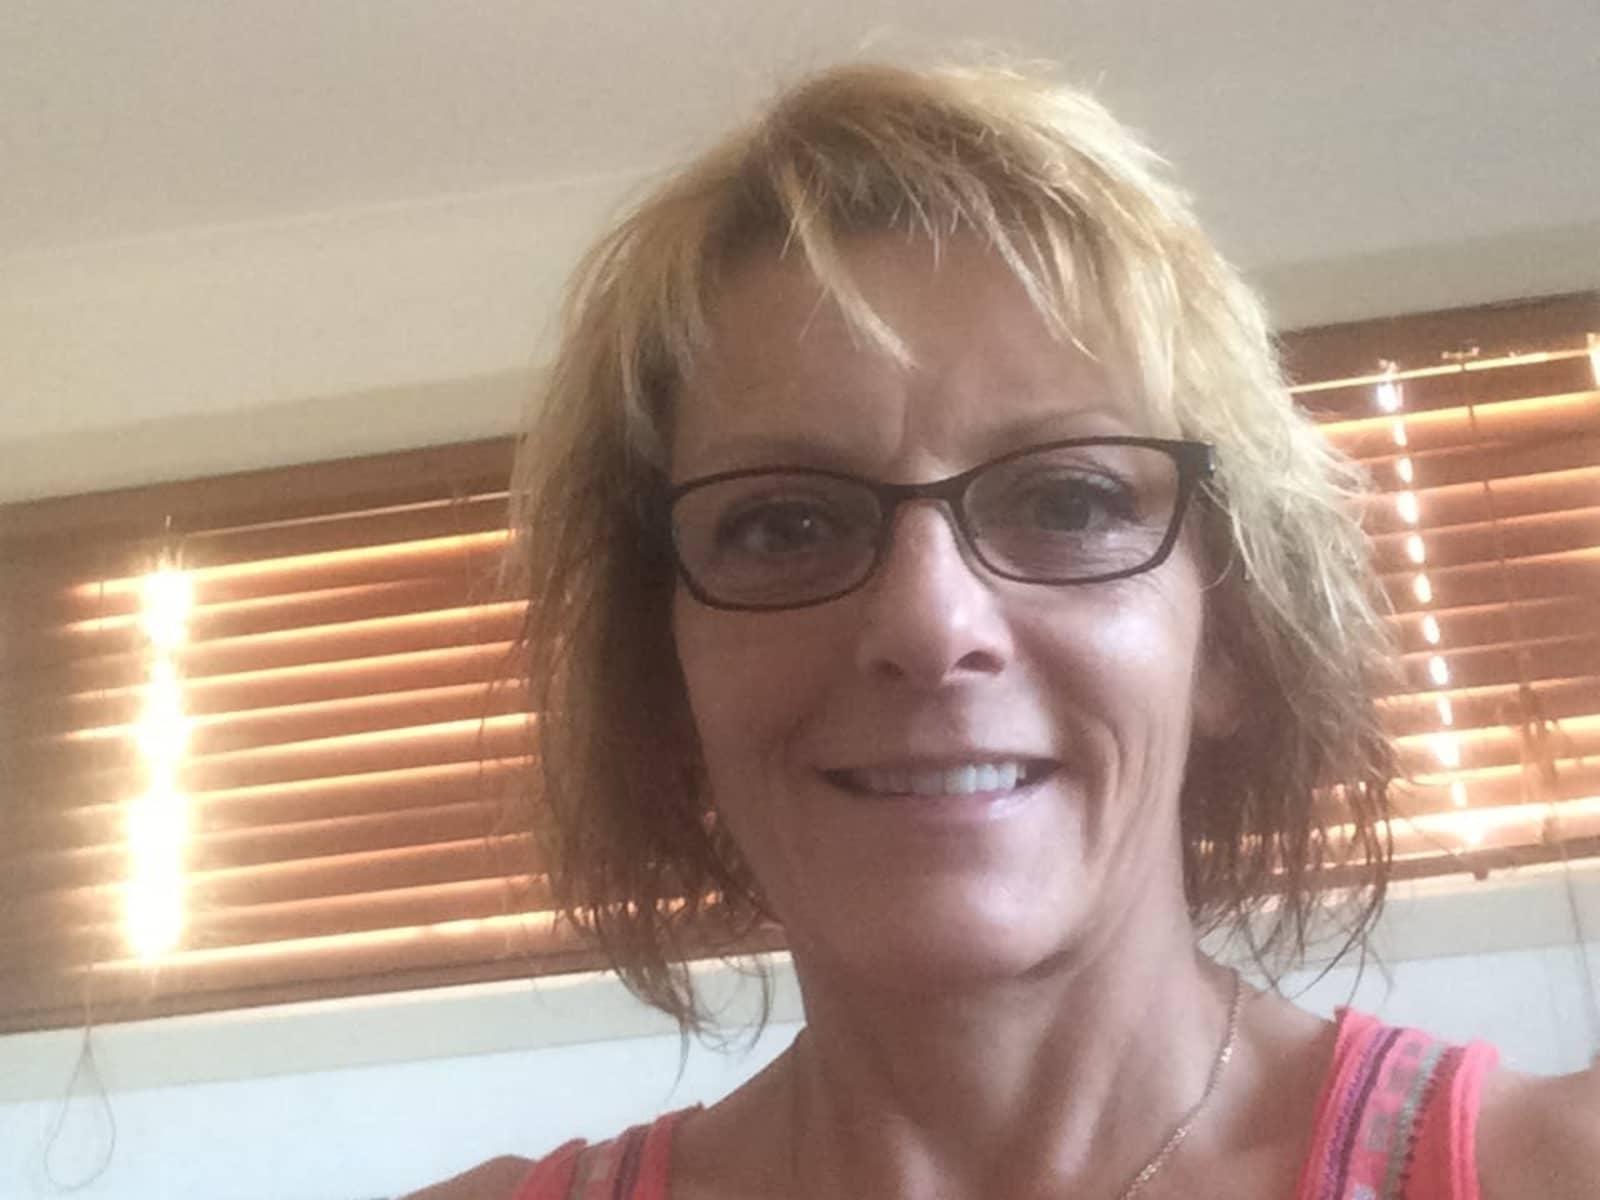 Michelle from Wonthaggi, Victoria, Australia